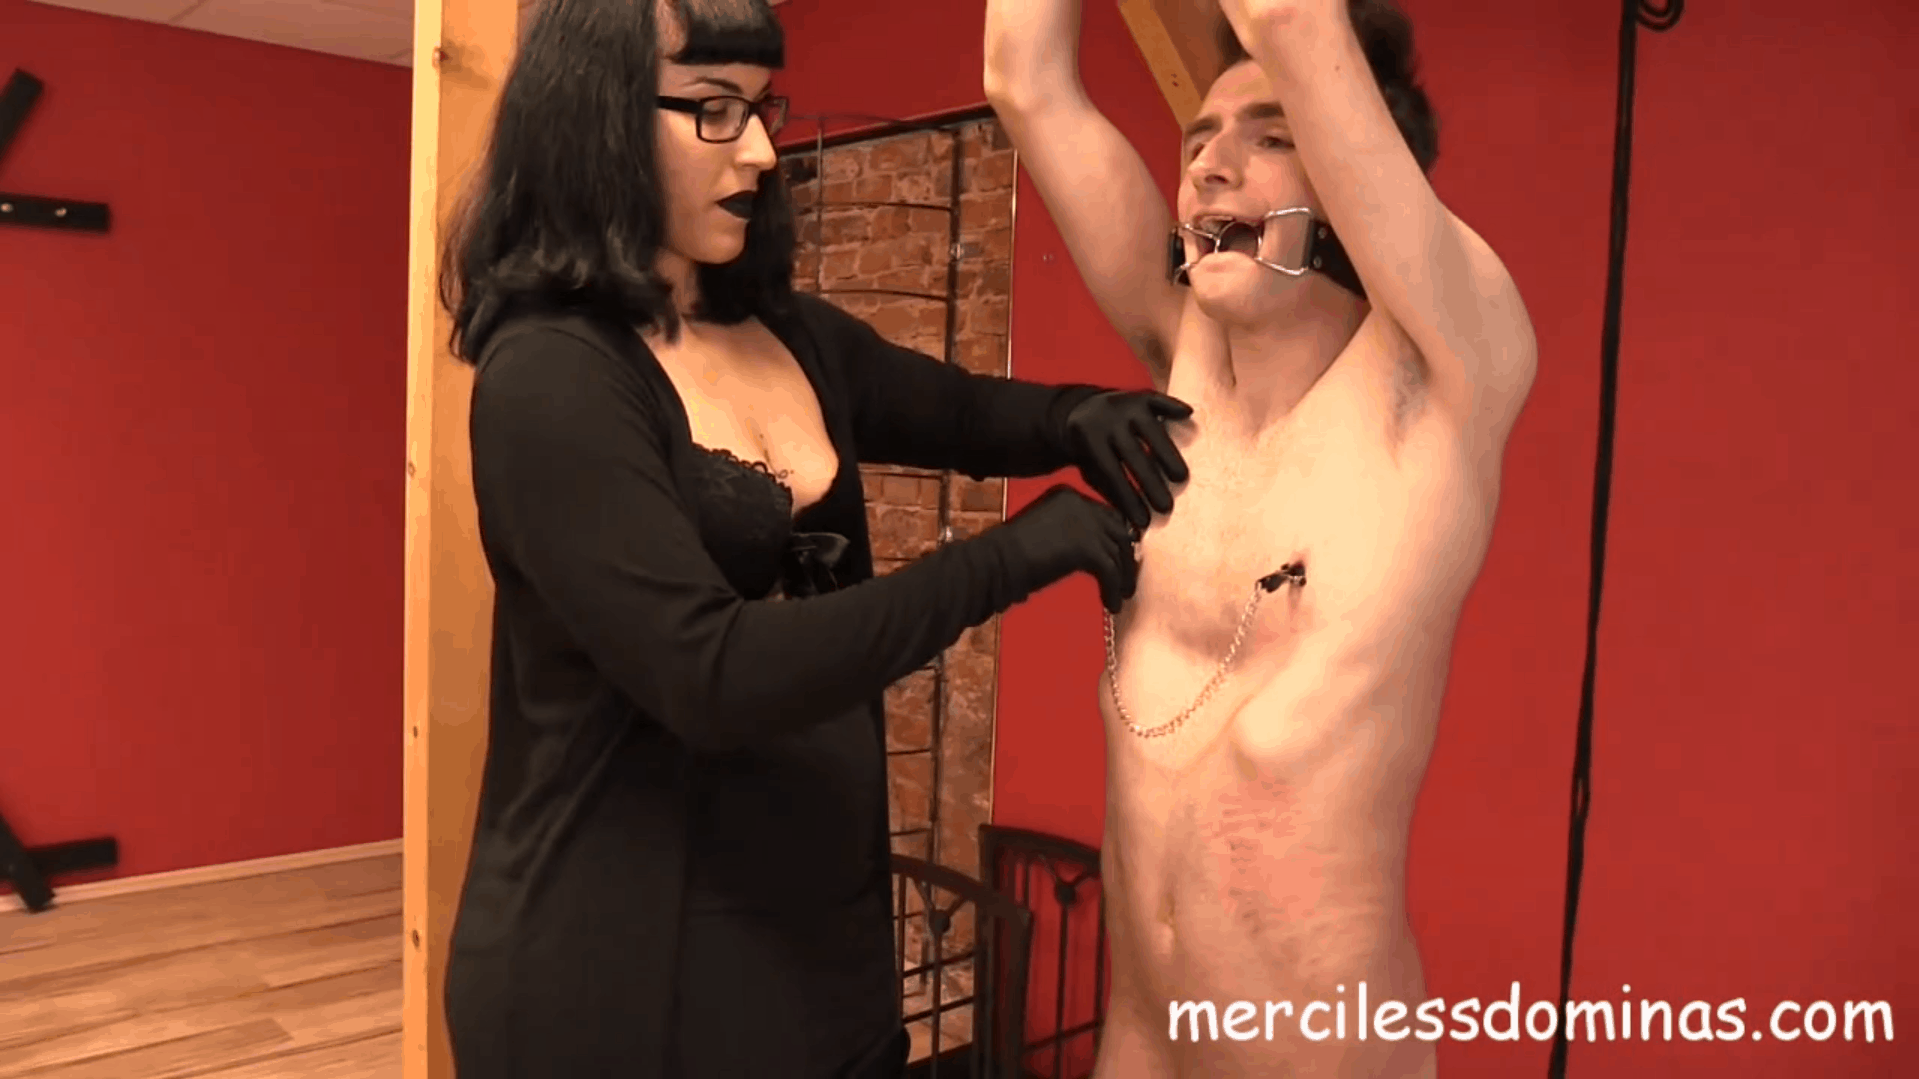 Filming Slave